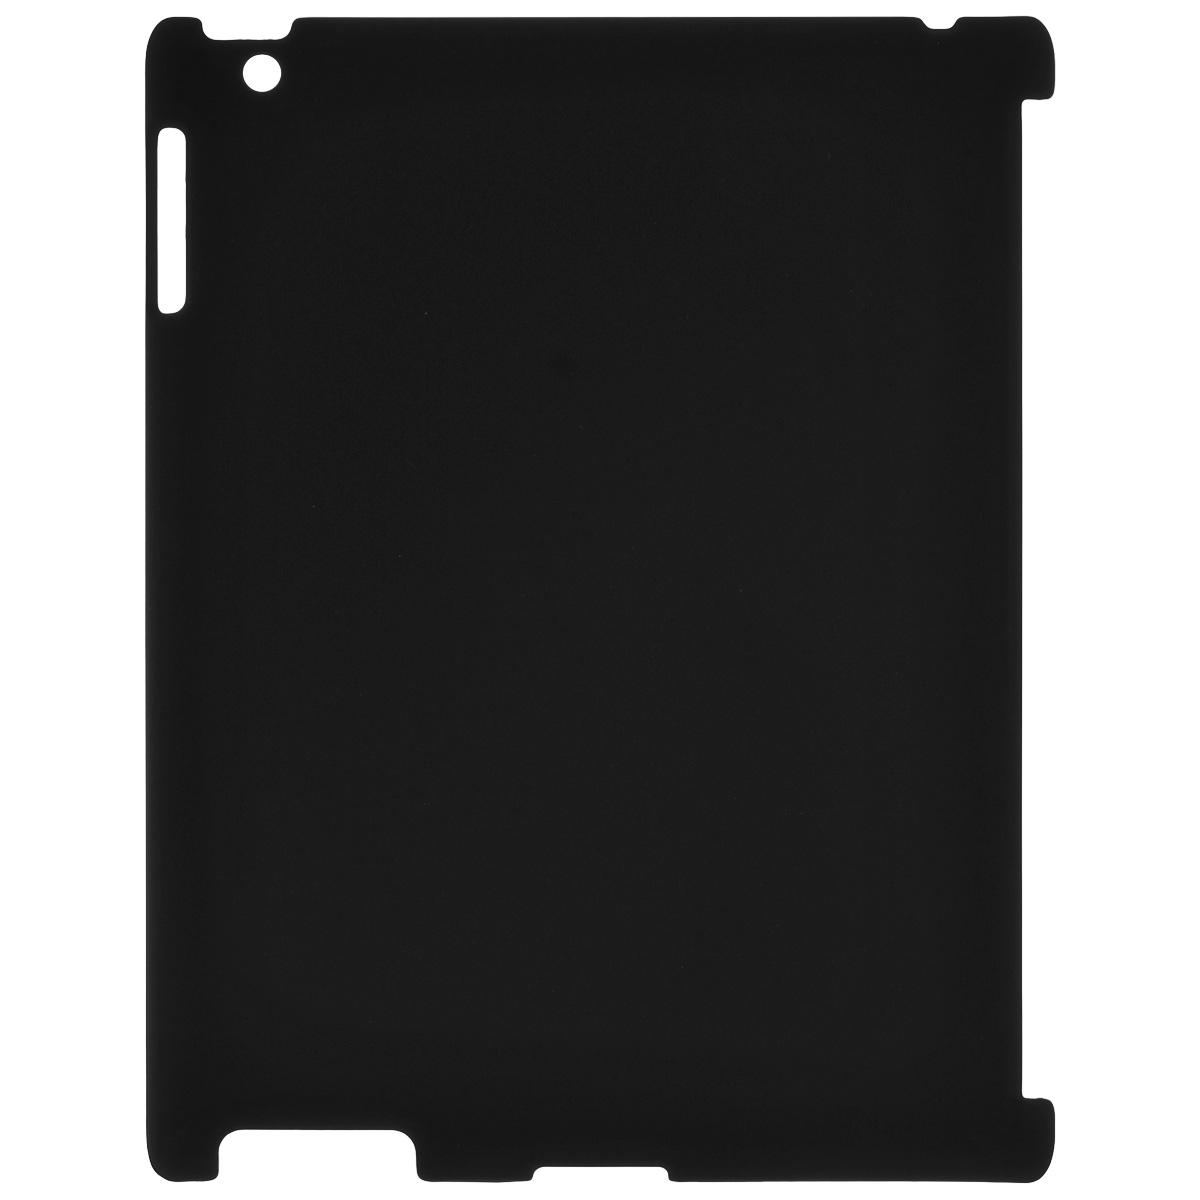 Black Horns чехол для iPad2, Black (BH-iD2201) стоимость